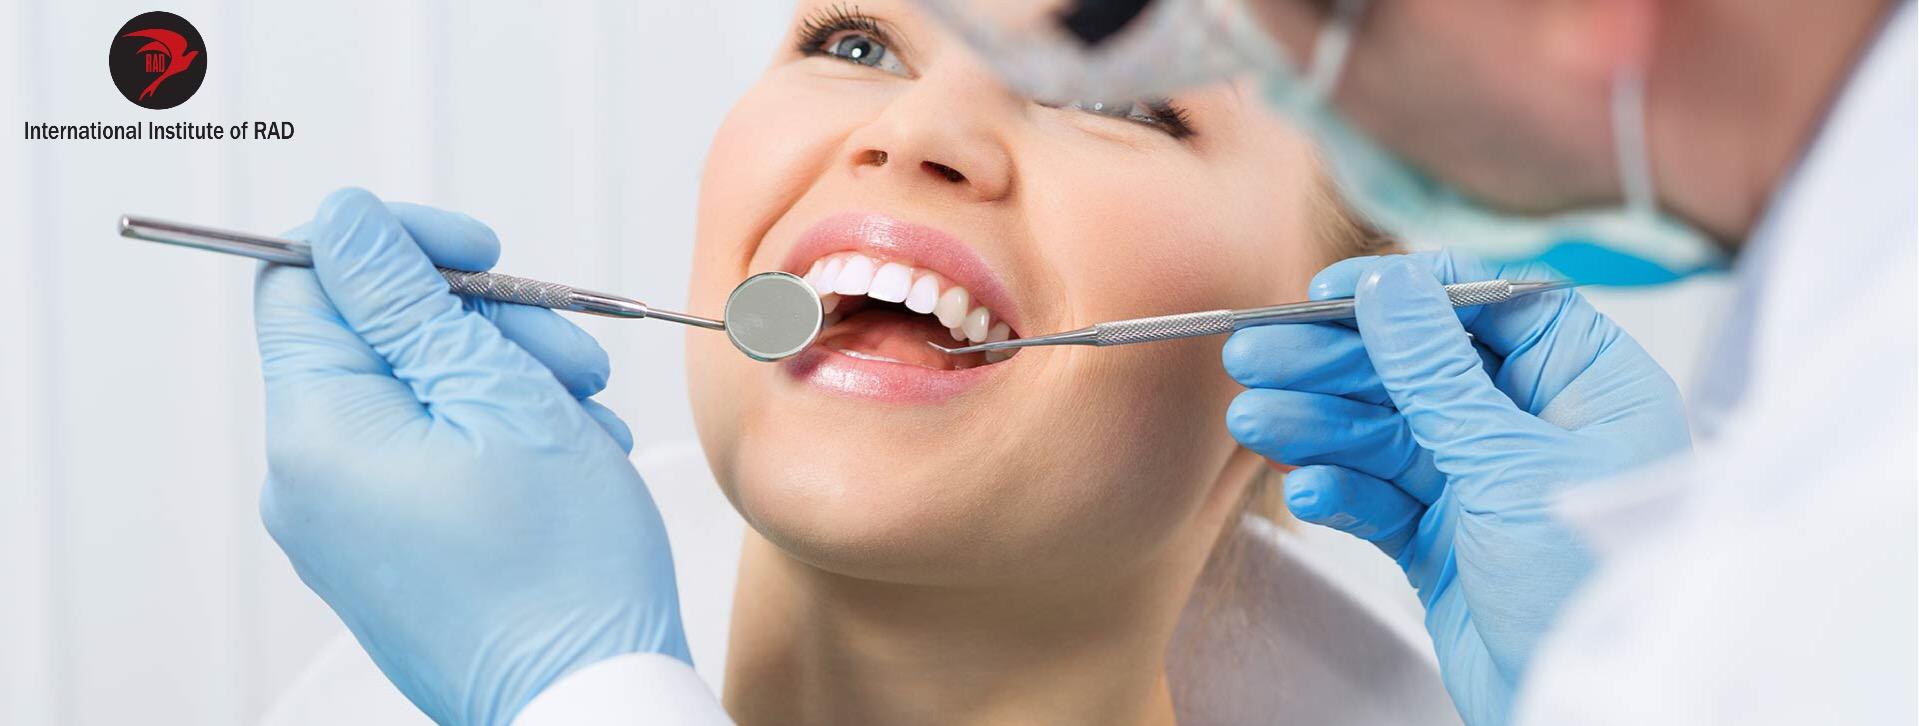 مهاجرت کاری دندانپزشکان